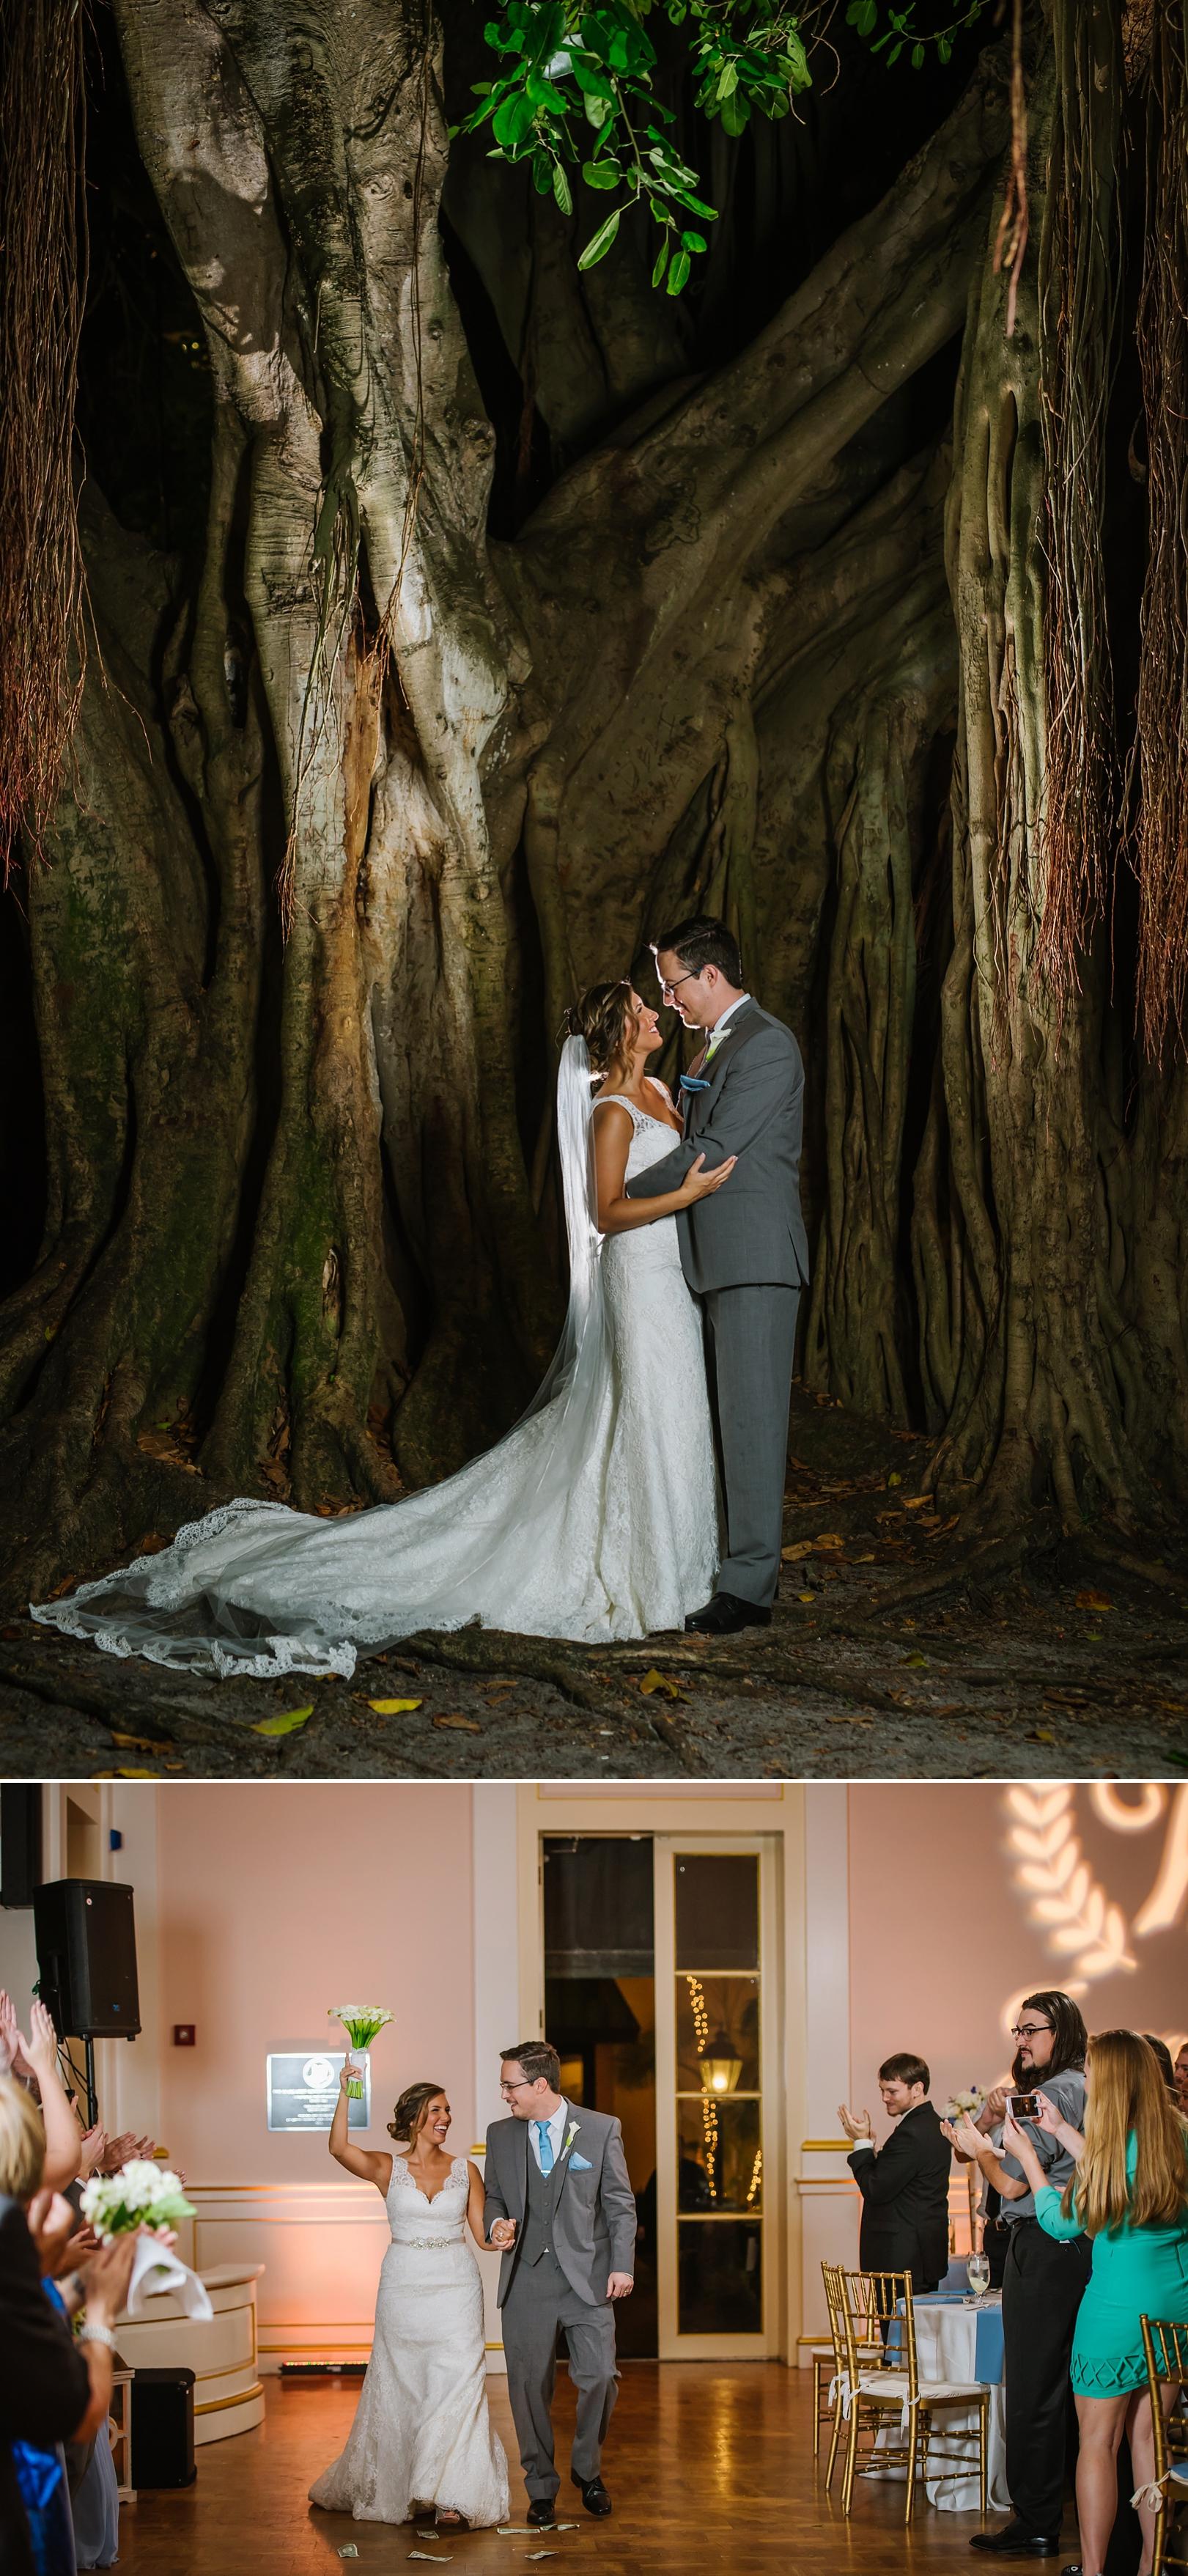 st-pete-art-museum-wedding-vinoy-ashlee-hamon-photography_0018.jpg